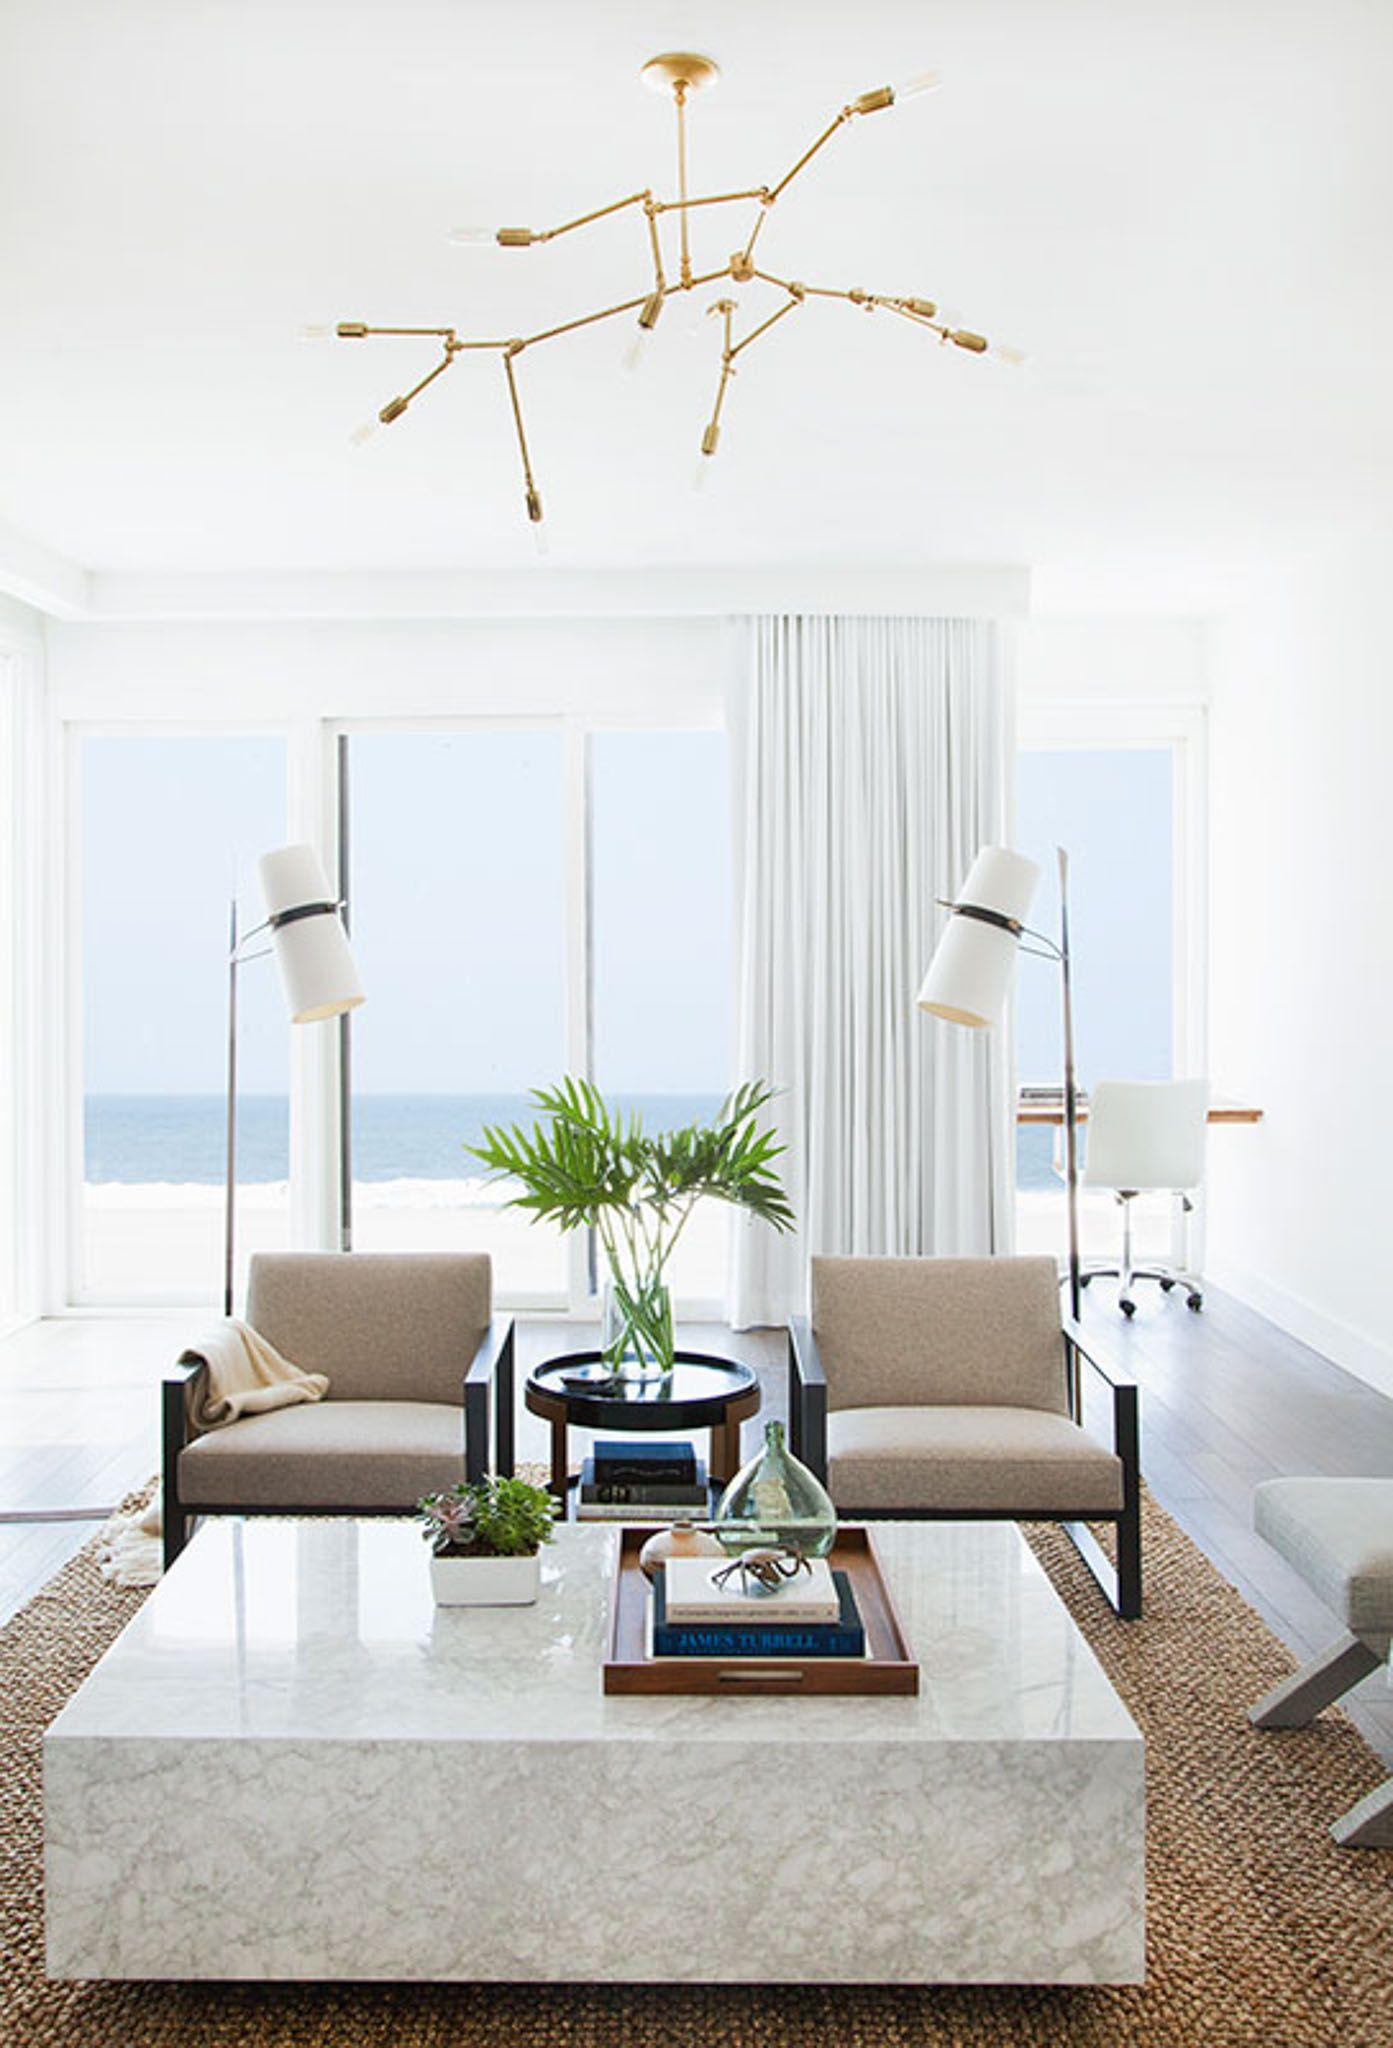 Minimalist modern beach house design. White walls and curtains, jute ...